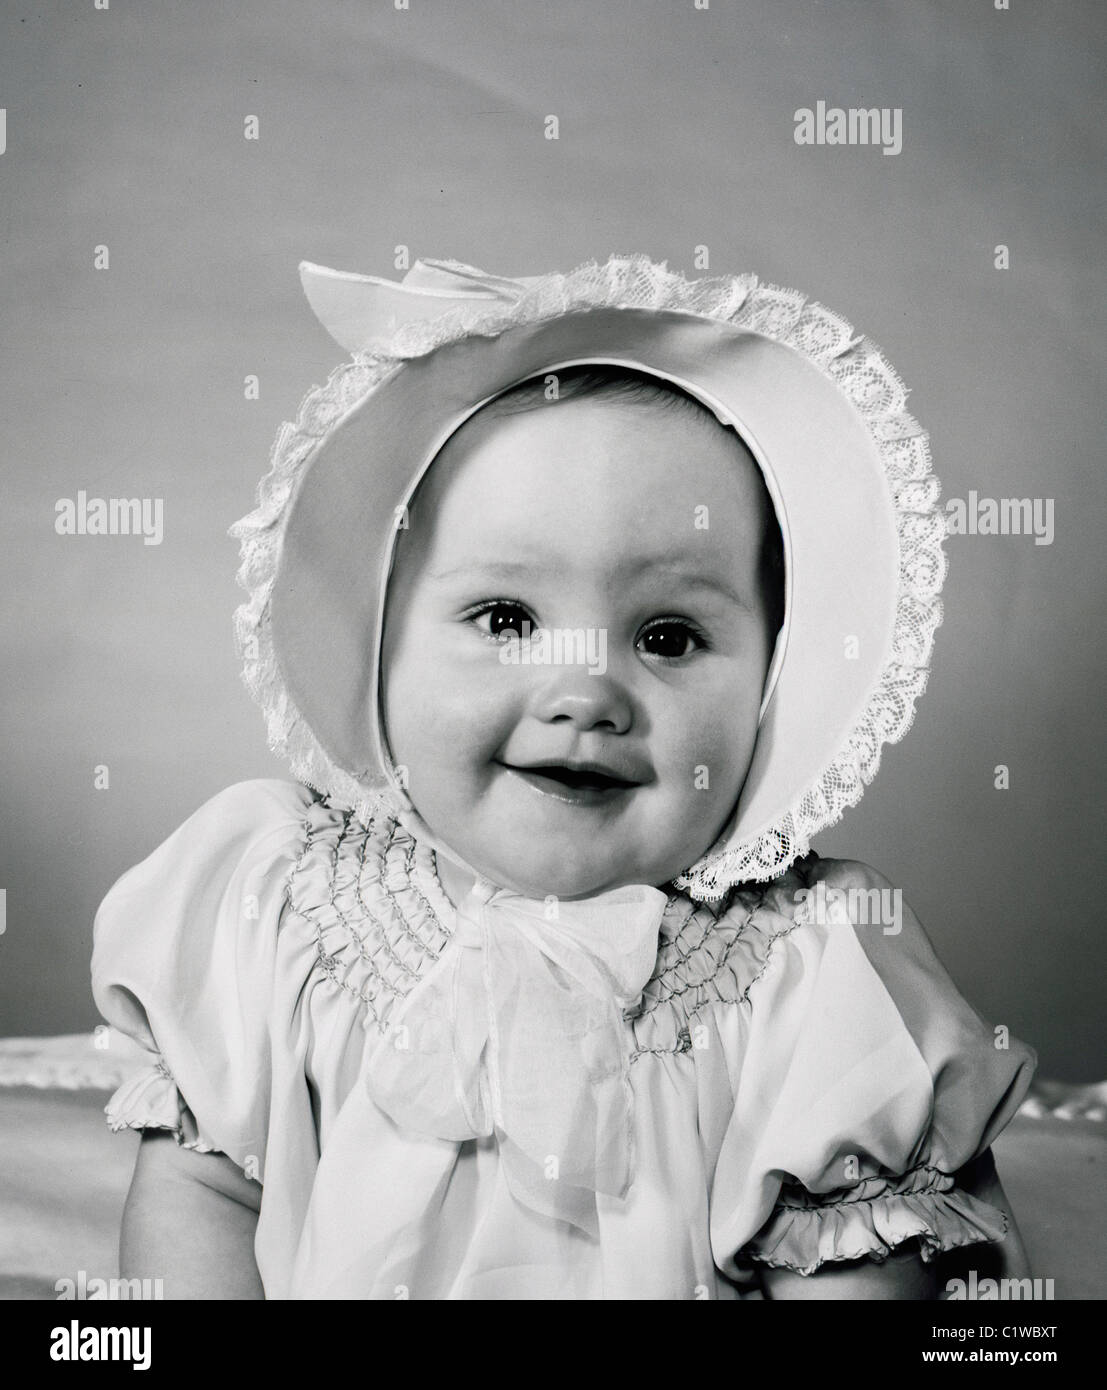 Portrait of baby wearing bonnet Stock Photo  35593568 - Alamy cf7369e67da